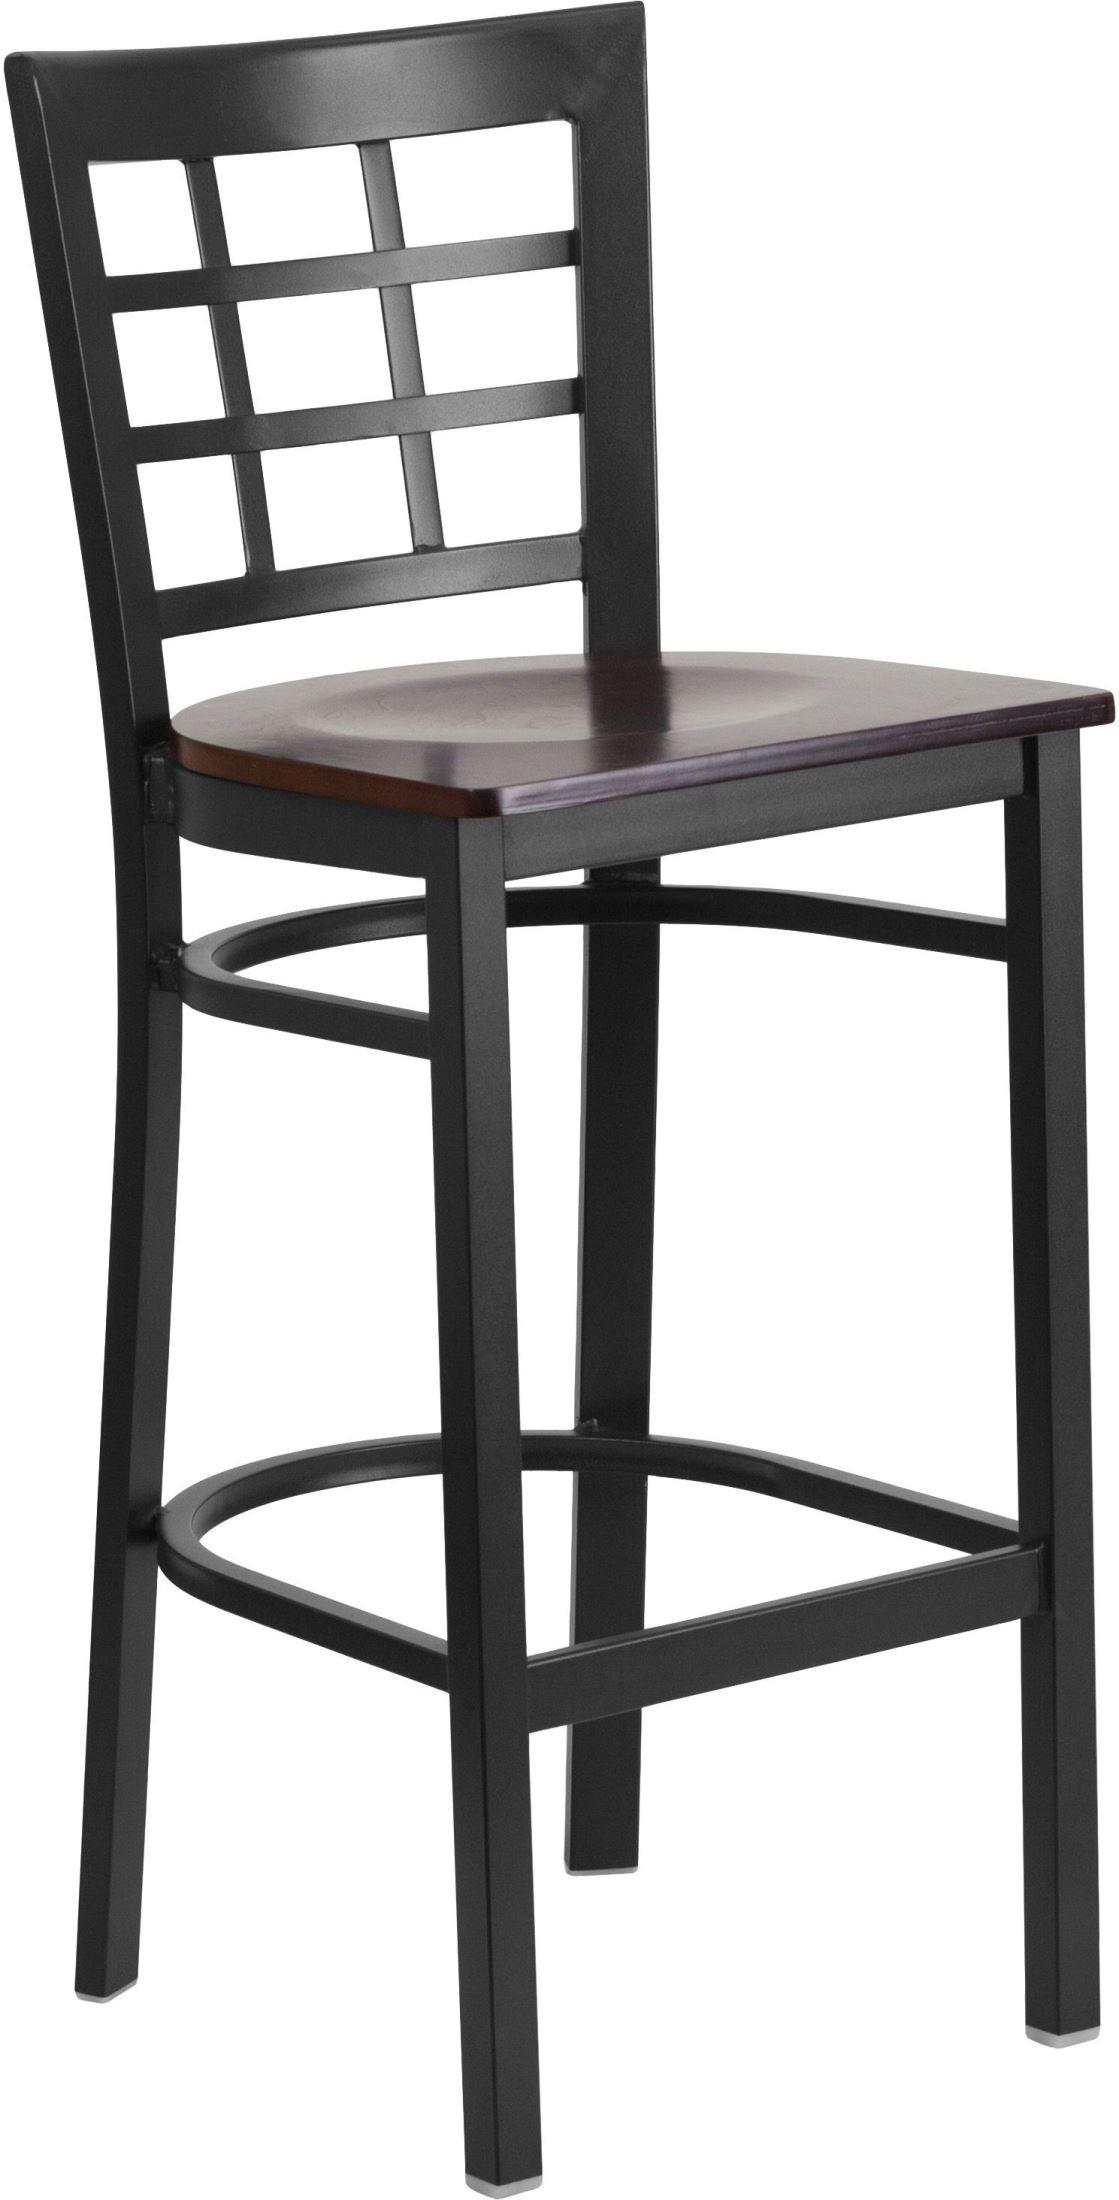 HERCULES Series Black Window Back Walnut Wood Seat  : xu dg6r7bwin bar walw gg from colemanfurniture.com size 1119 x 2200 jpeg 189kB